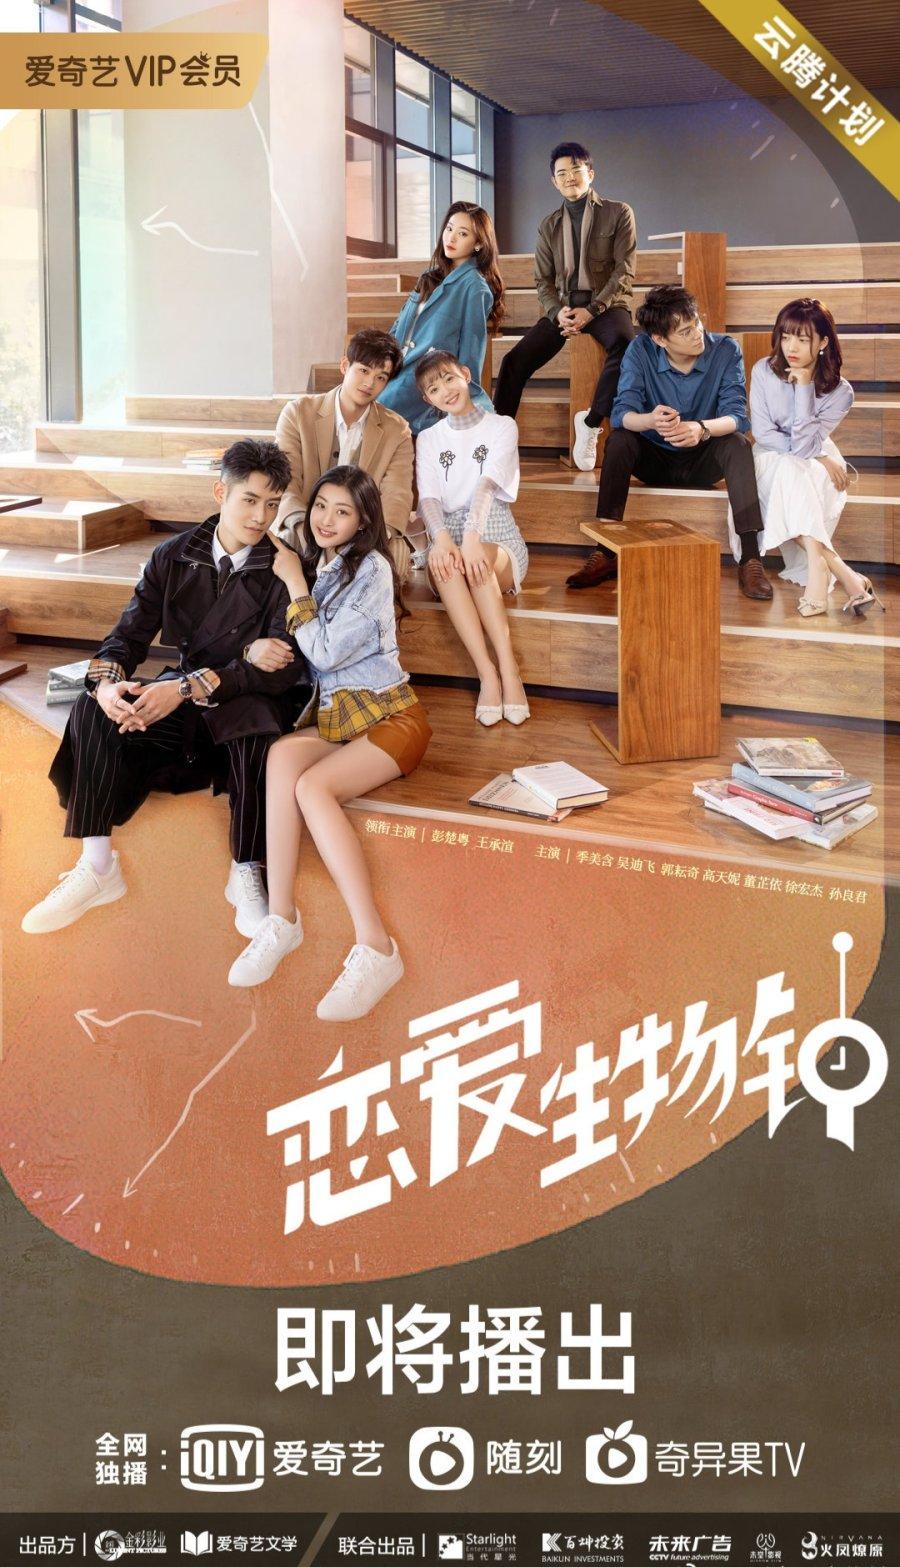 0g6Ze 4f - Время любви ✸ 2021 ✸ Китай